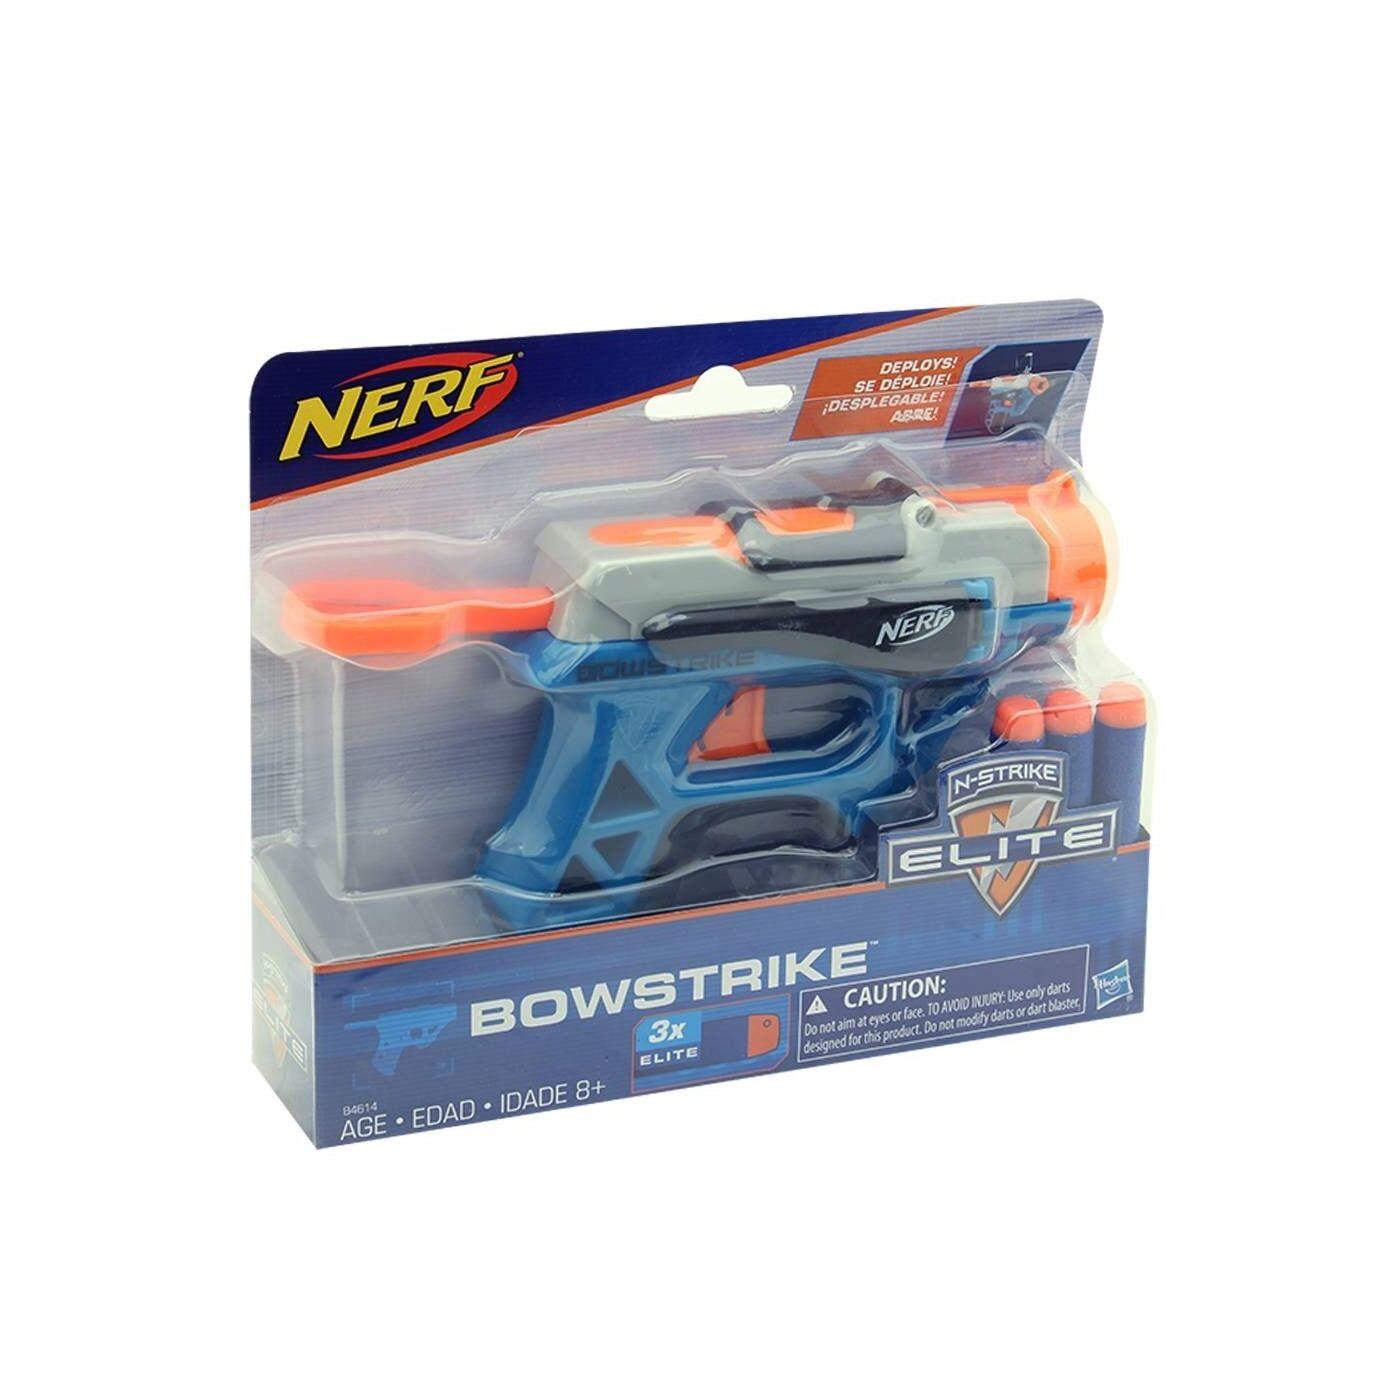 Nerf nstrike Bowstrike